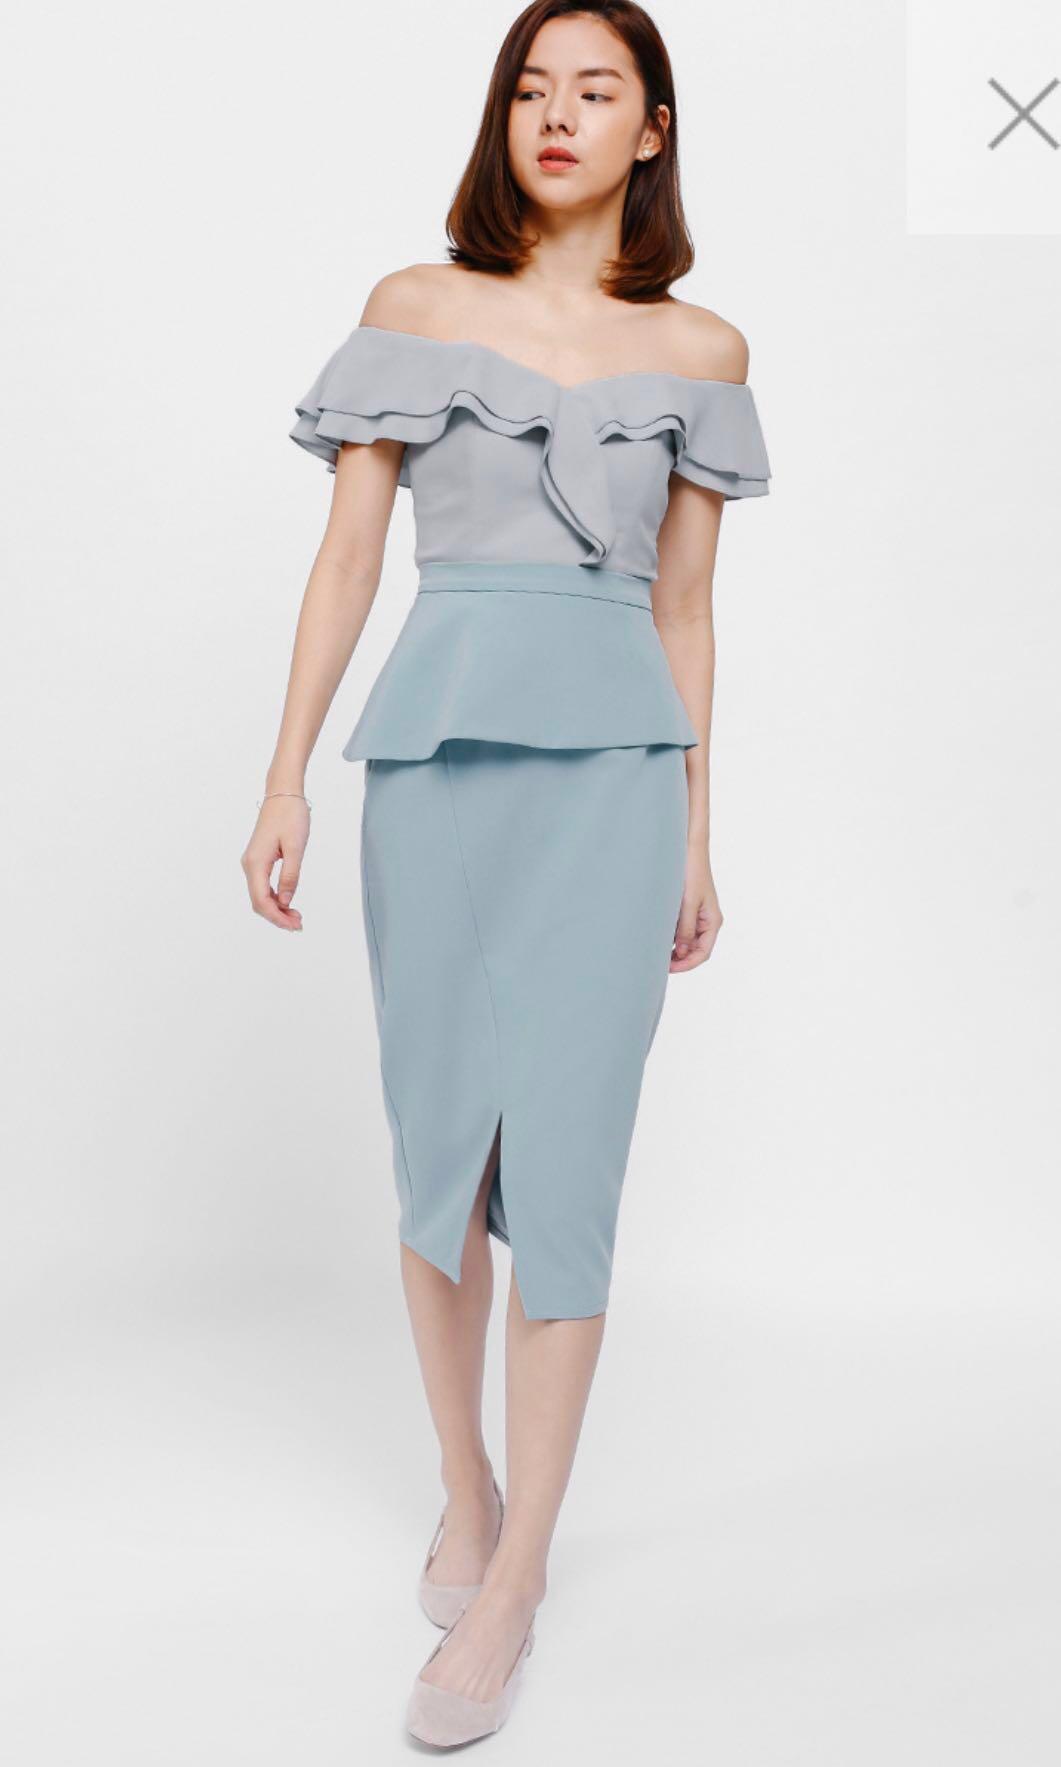 85a8812d1d4c Love Bonito LB Kessla Asymmetrical Peplum Midi Skirt Baby Blue S ...